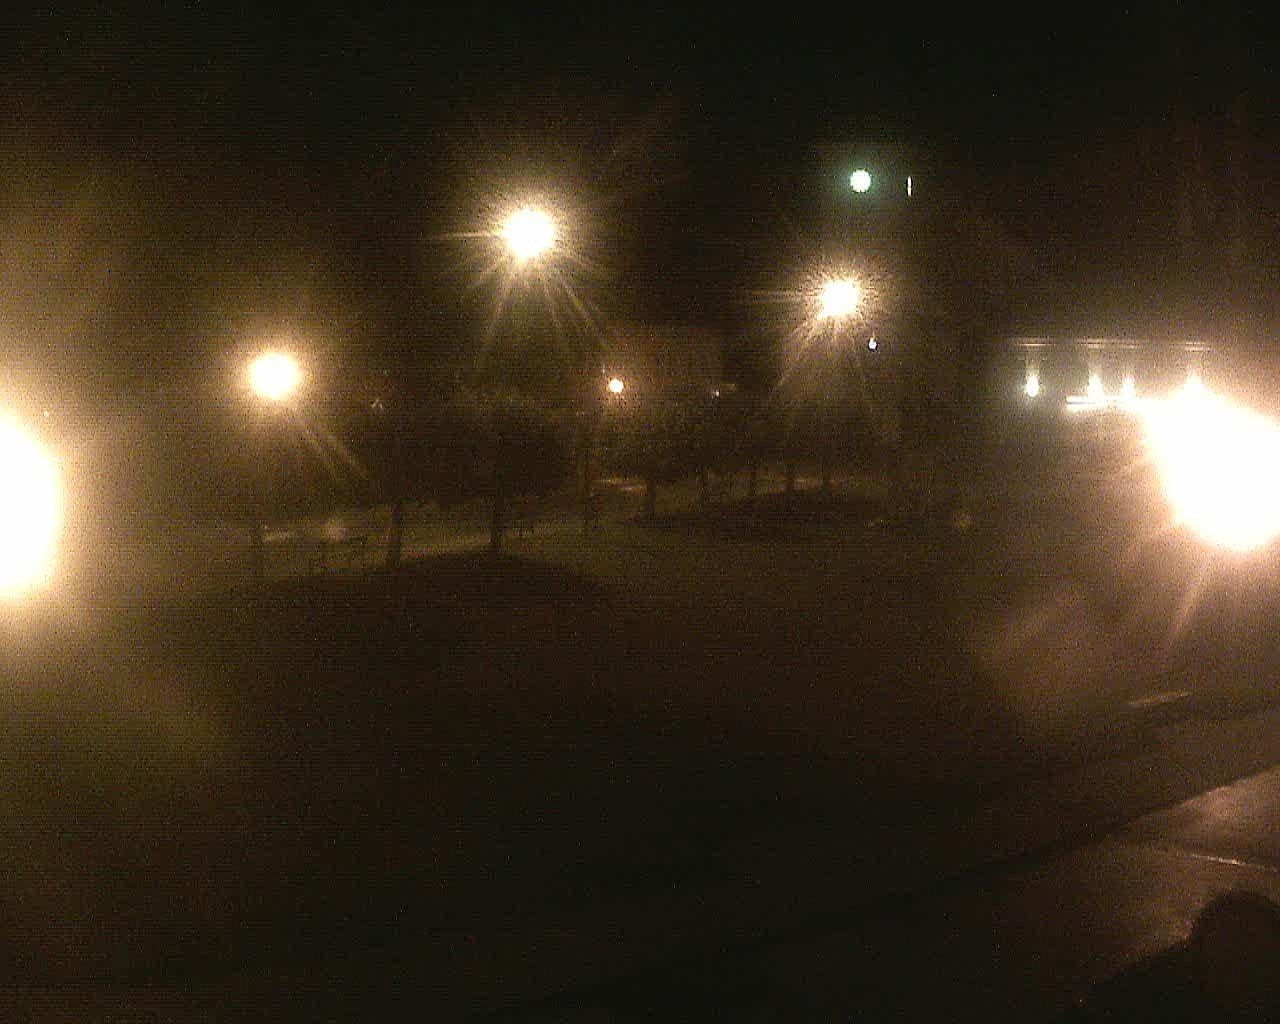 http://kamery.ttnet.cz/image.php?cam=ro&online=1